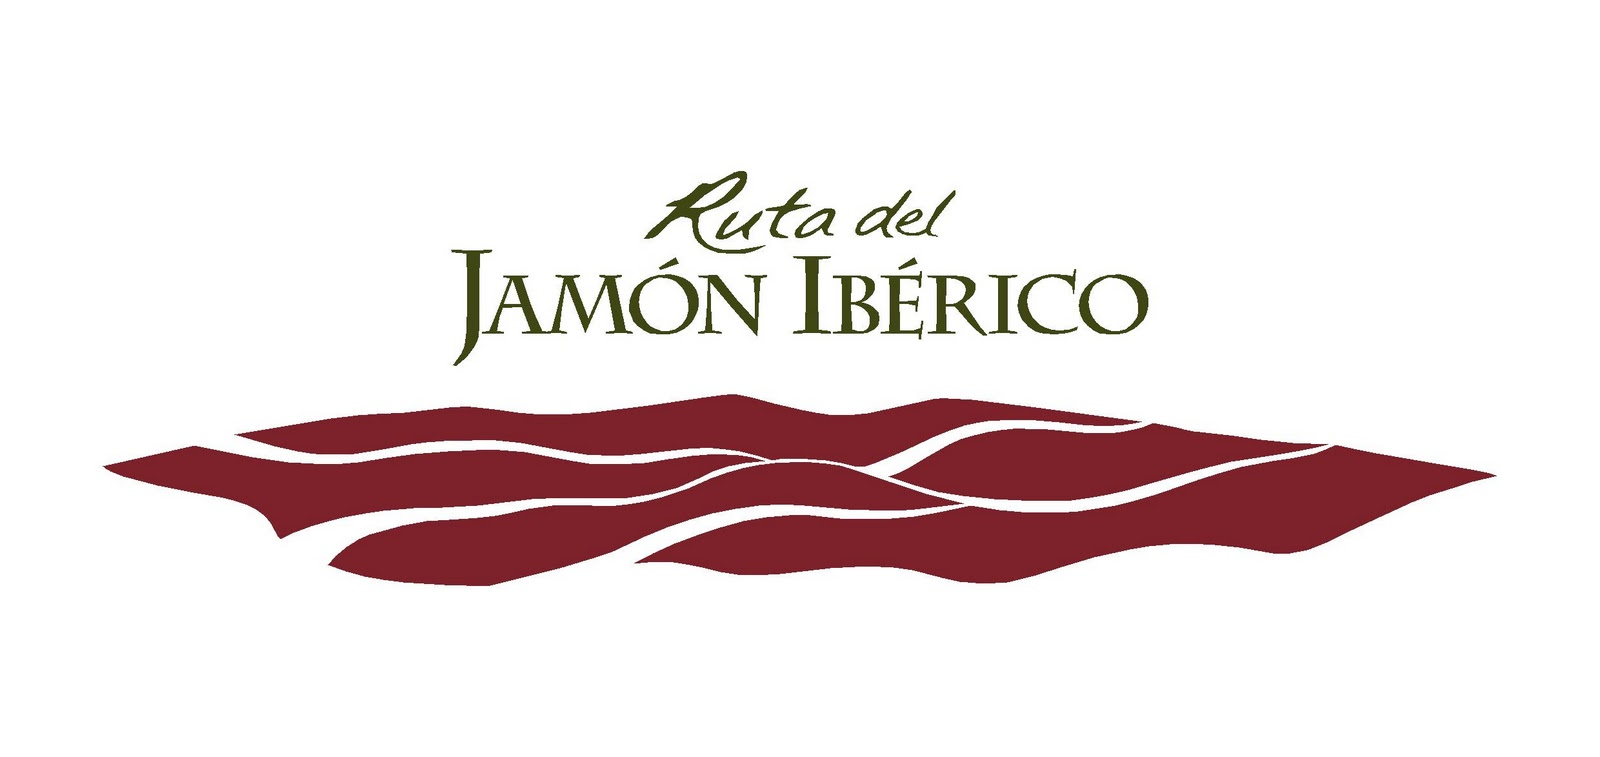 Ruta del jamón ibérico